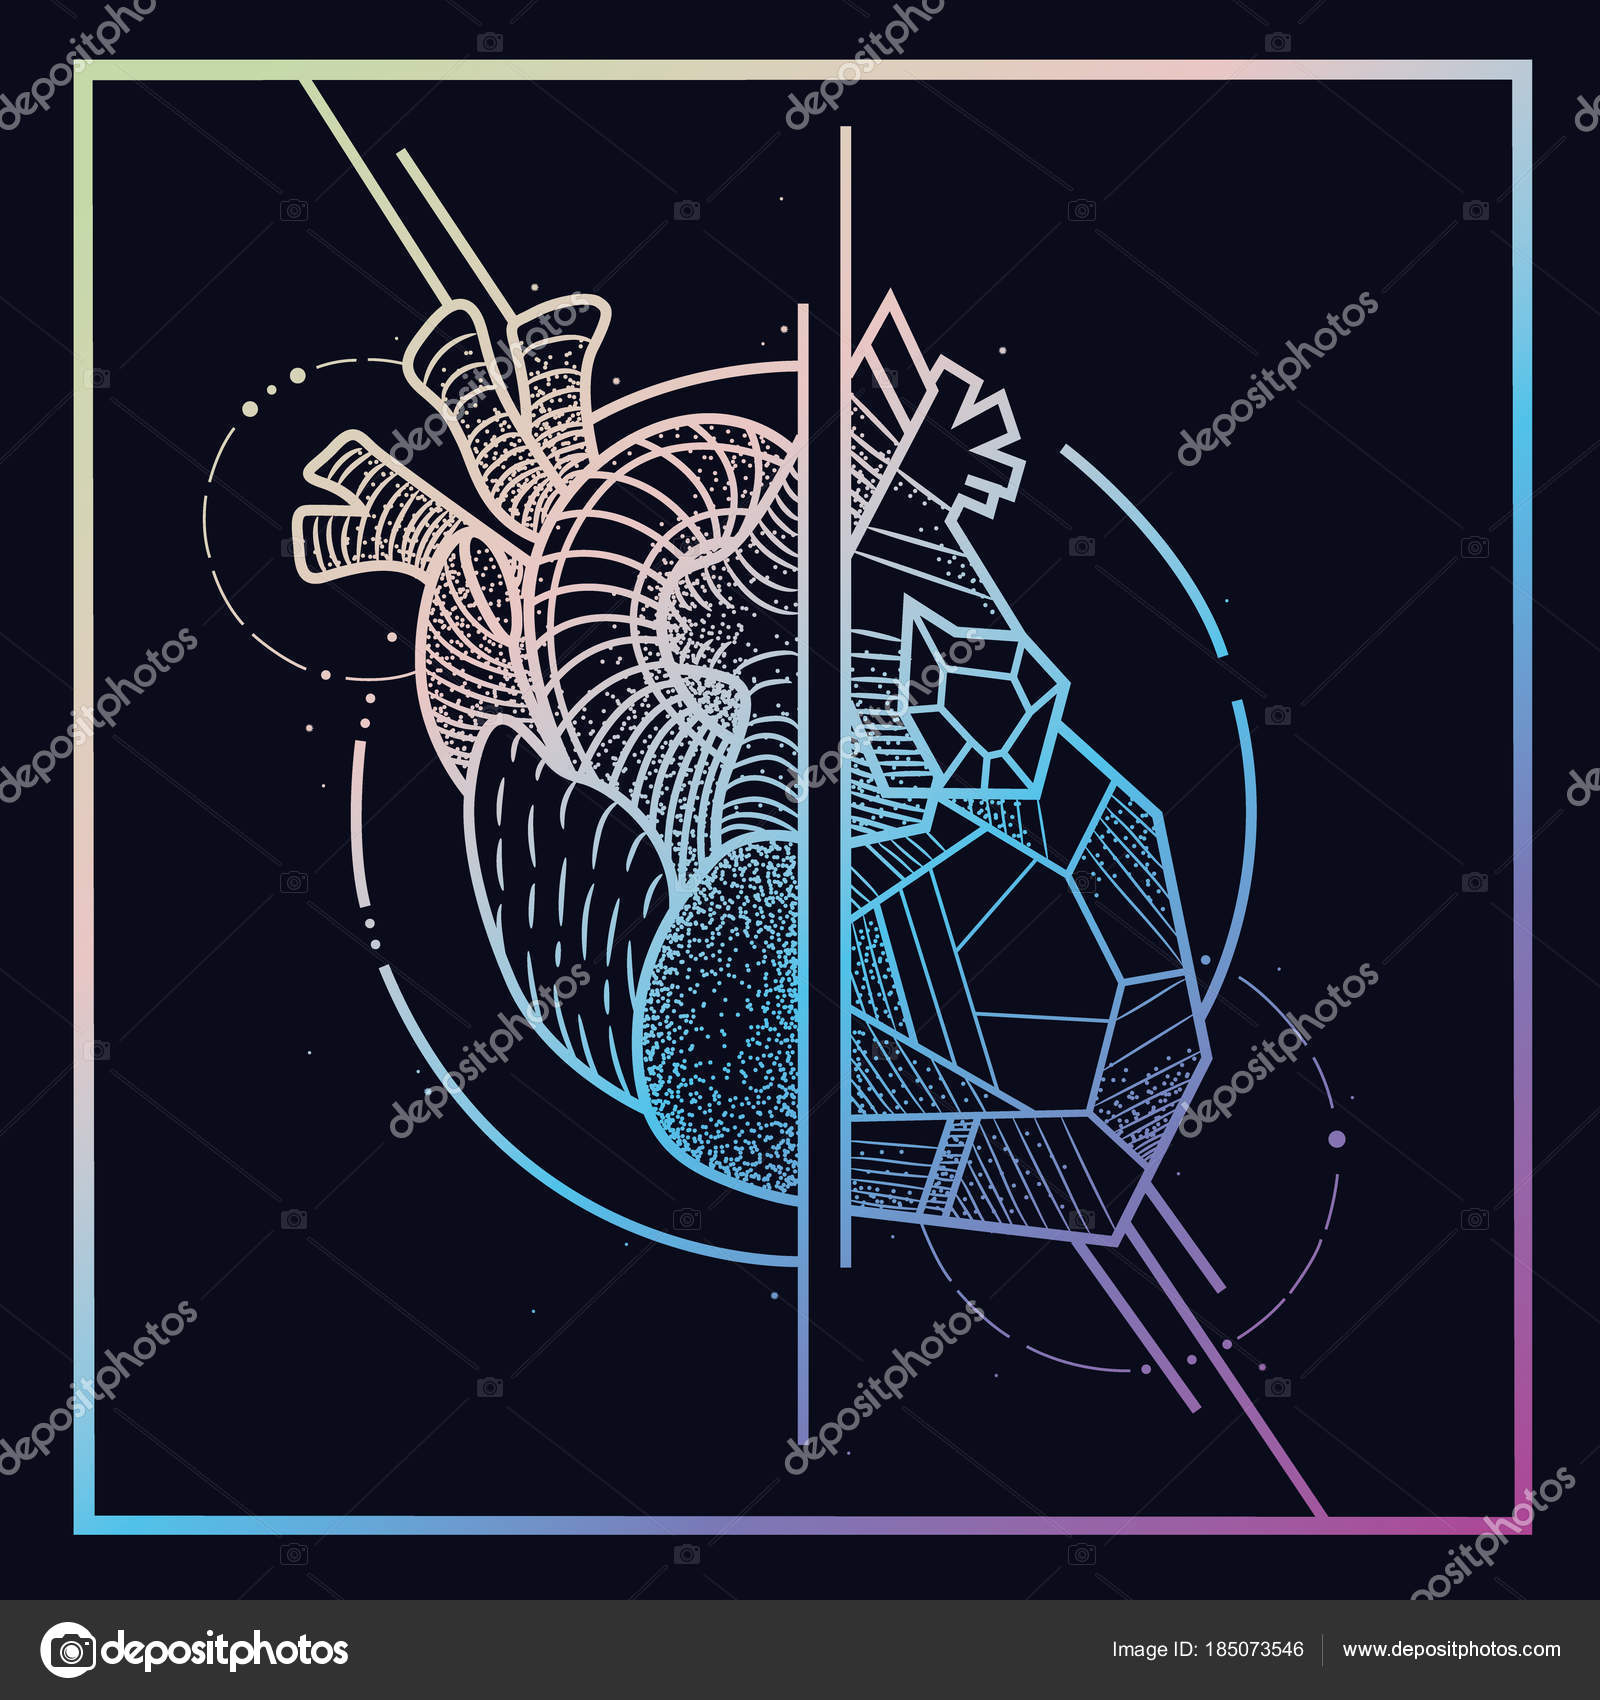 Heart Brain All Seeing Eye Style Engraving Polygonal Sketch